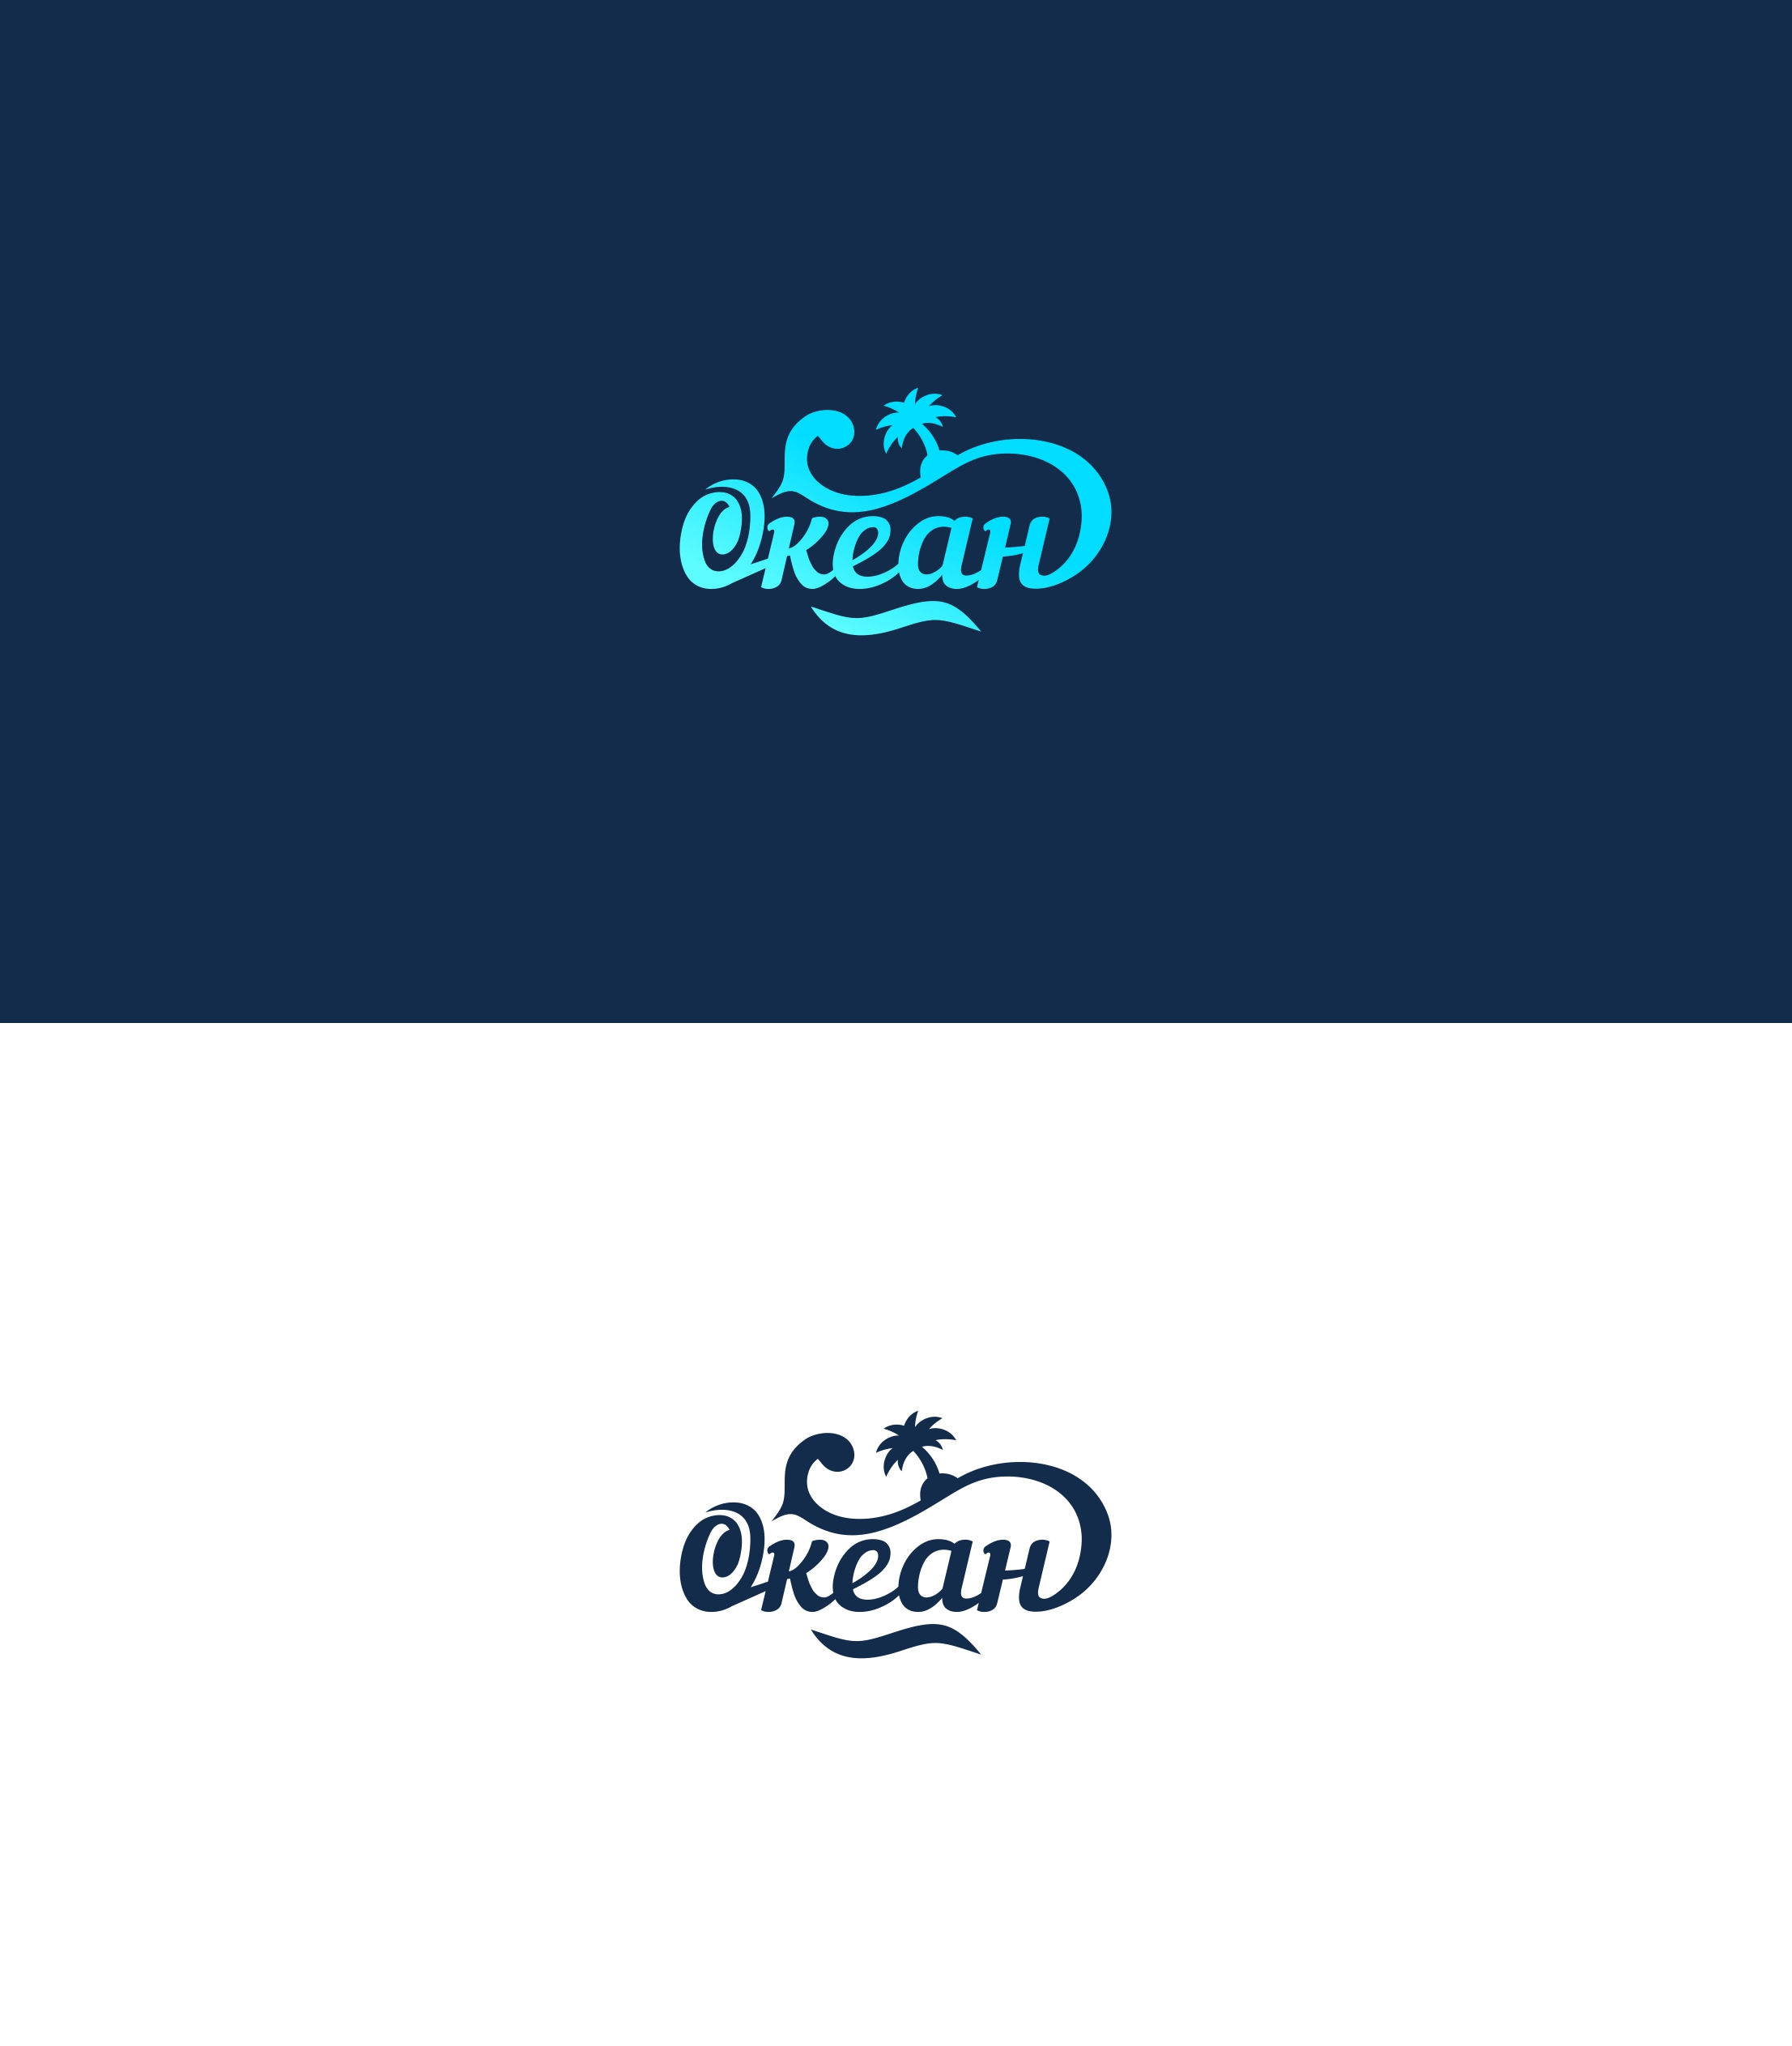 Логотип - Океан